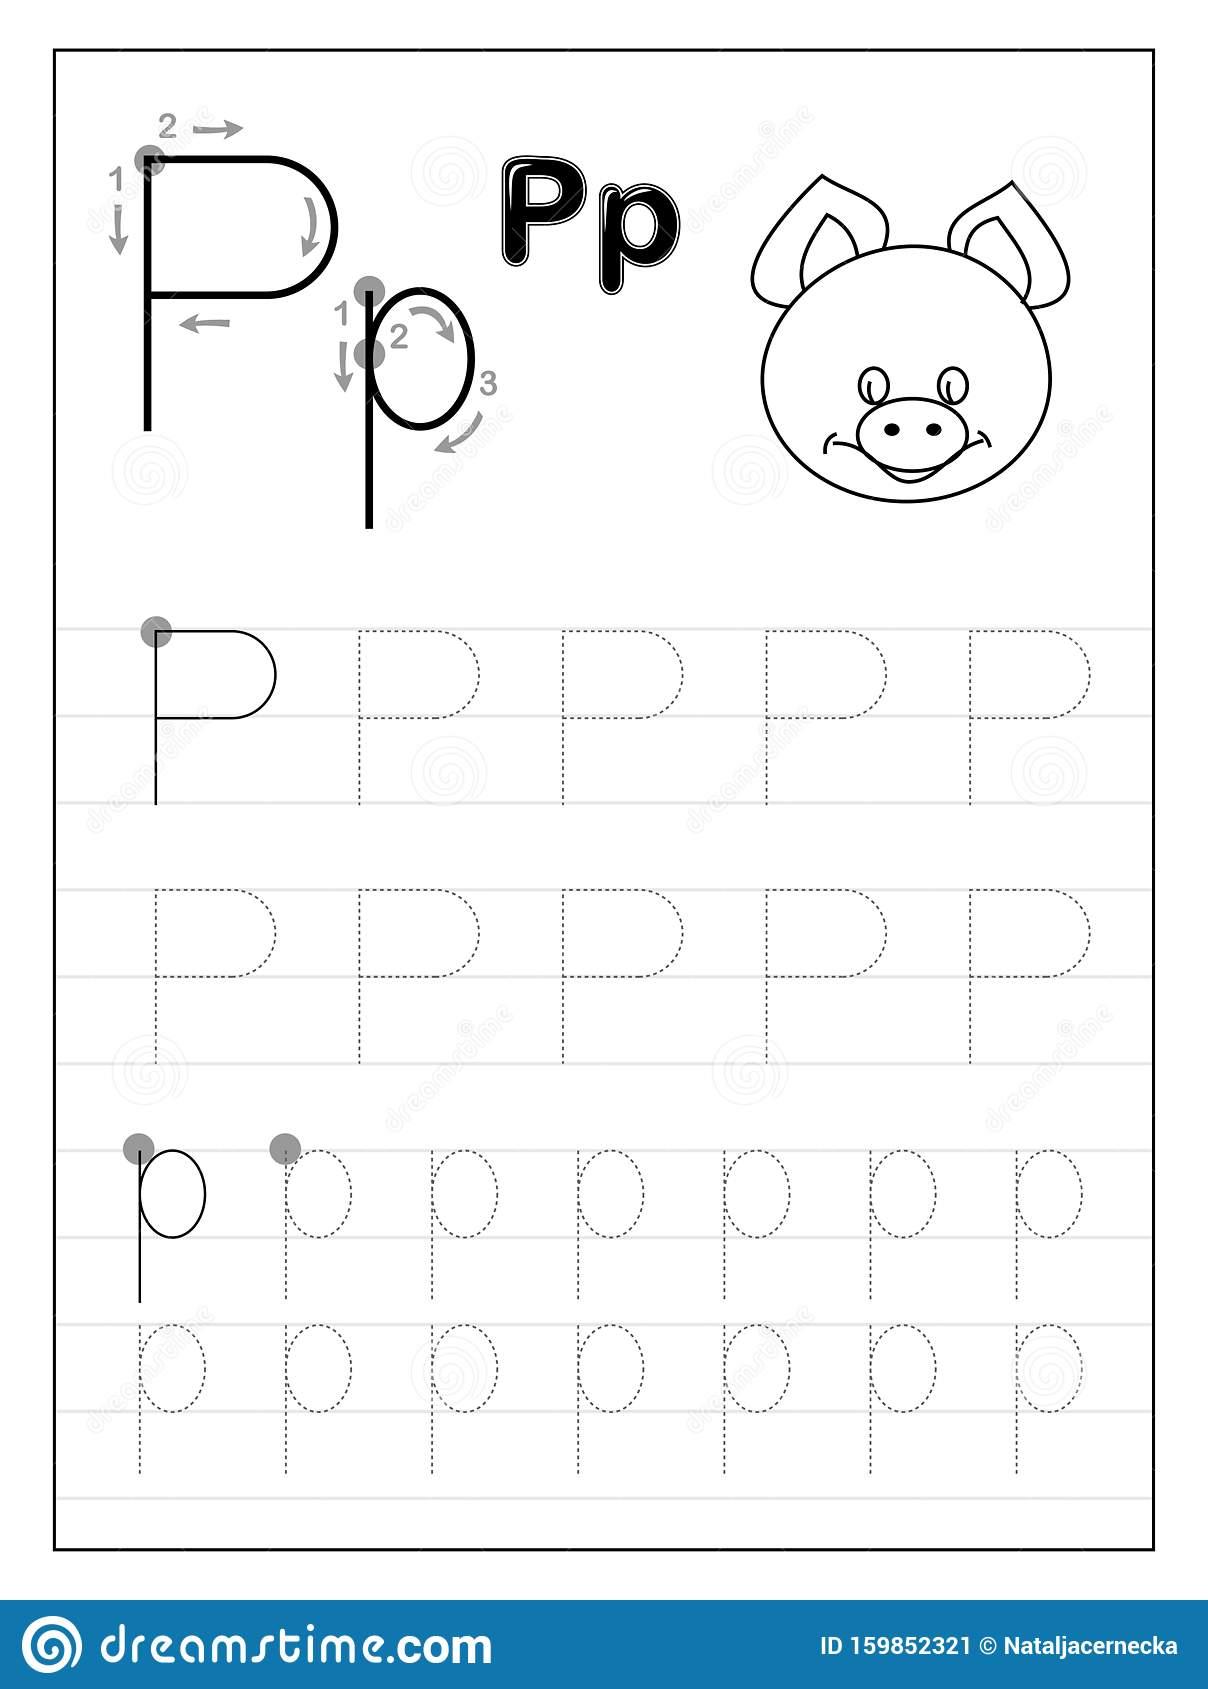 Printable Letter Templates For Preschoolber Tracingheets regarding Letter Tracing Download Free